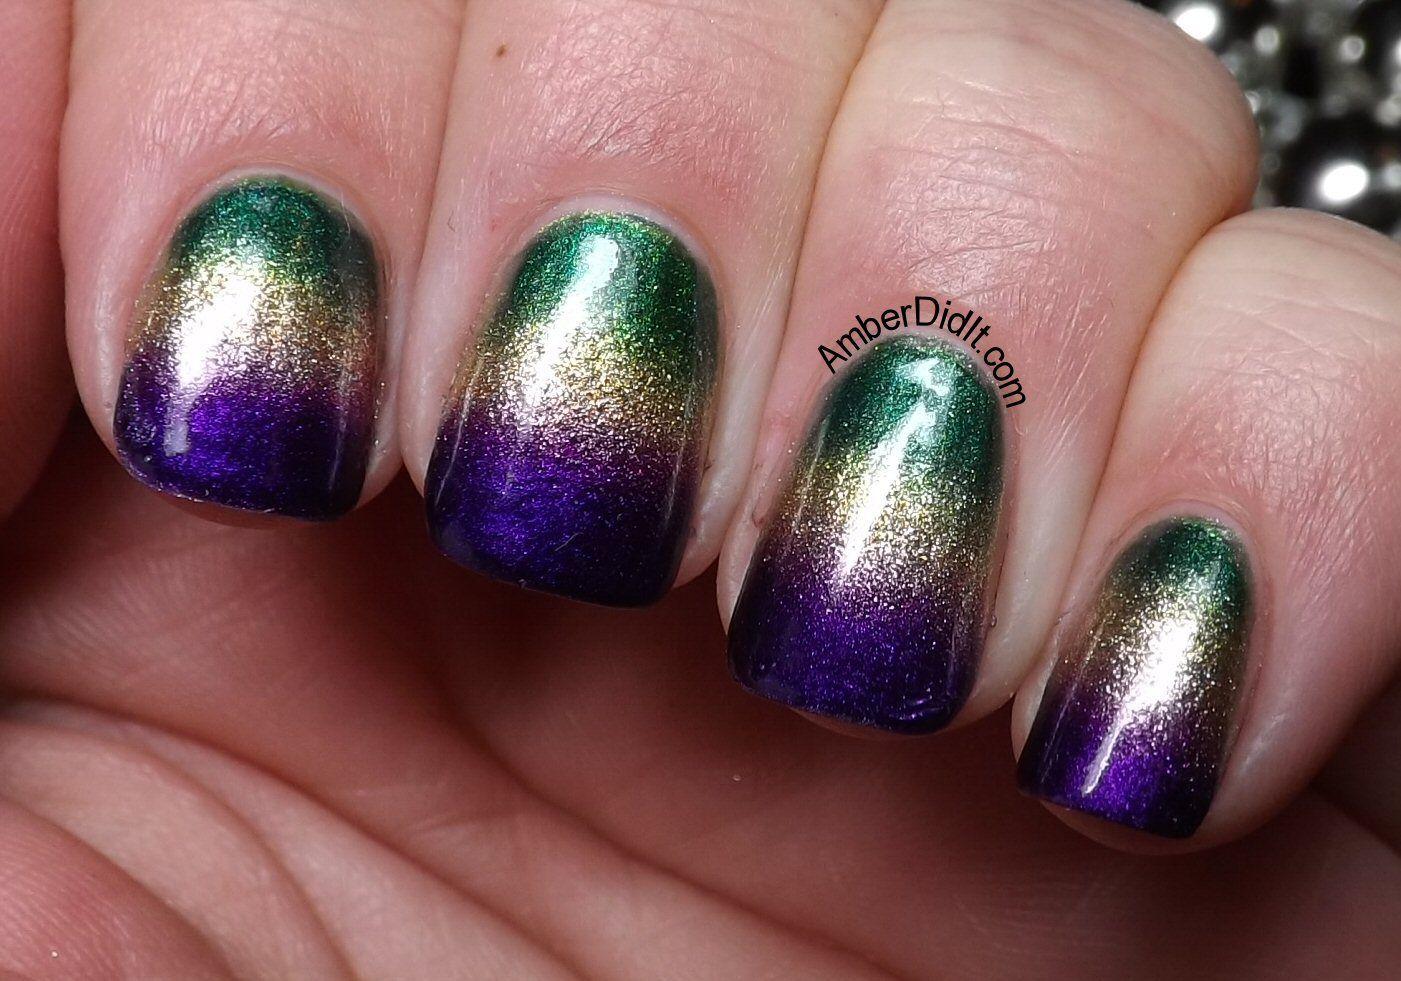 Mardi Gras Designs For Nails